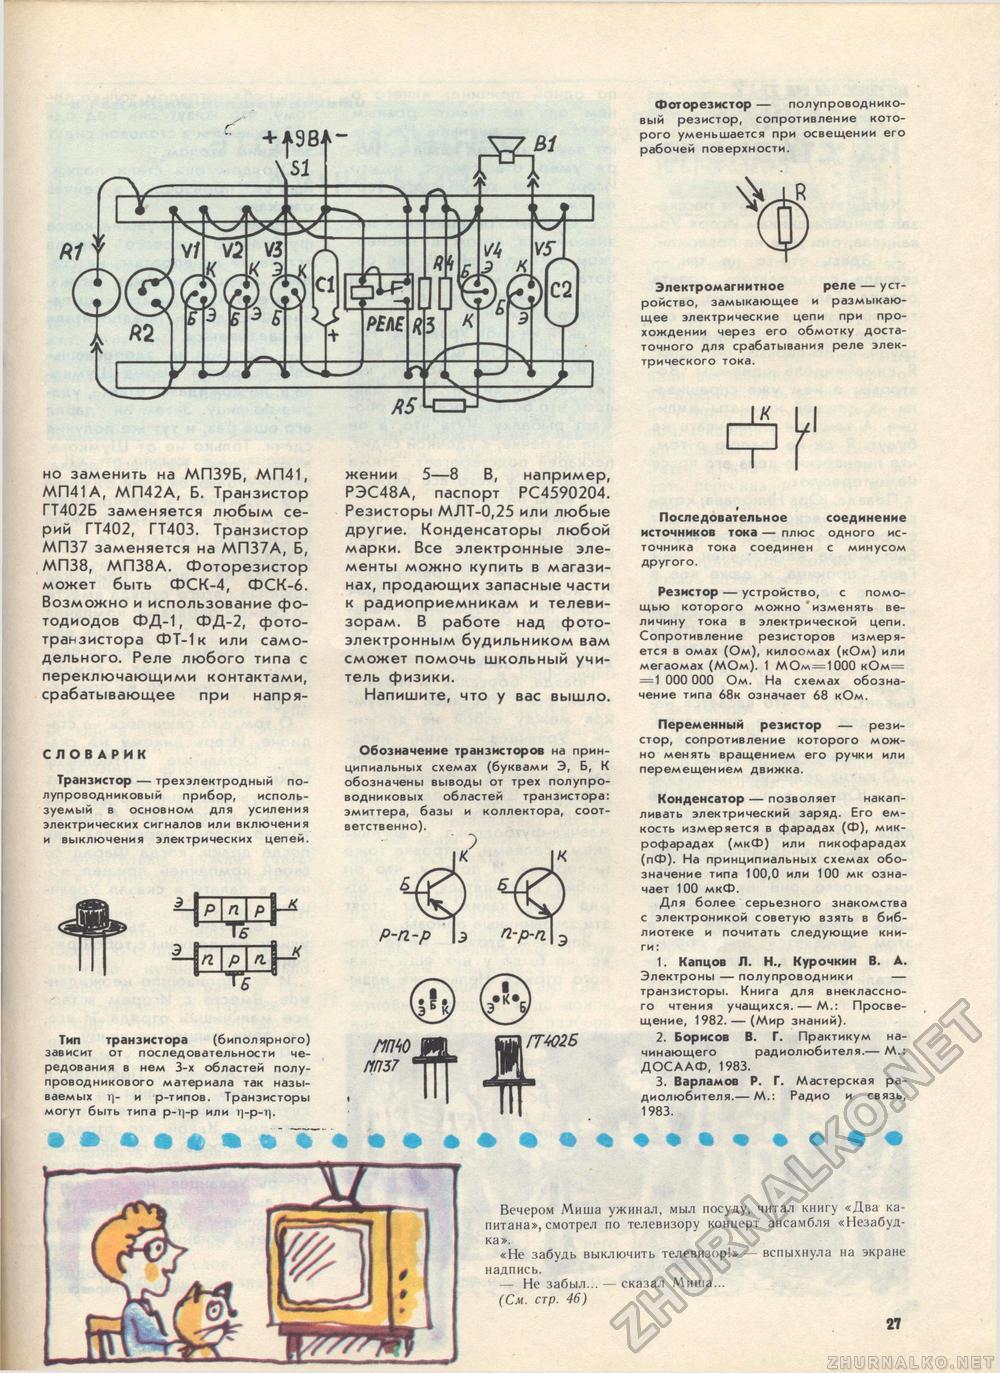 Как обозначается база транзистора на схеме